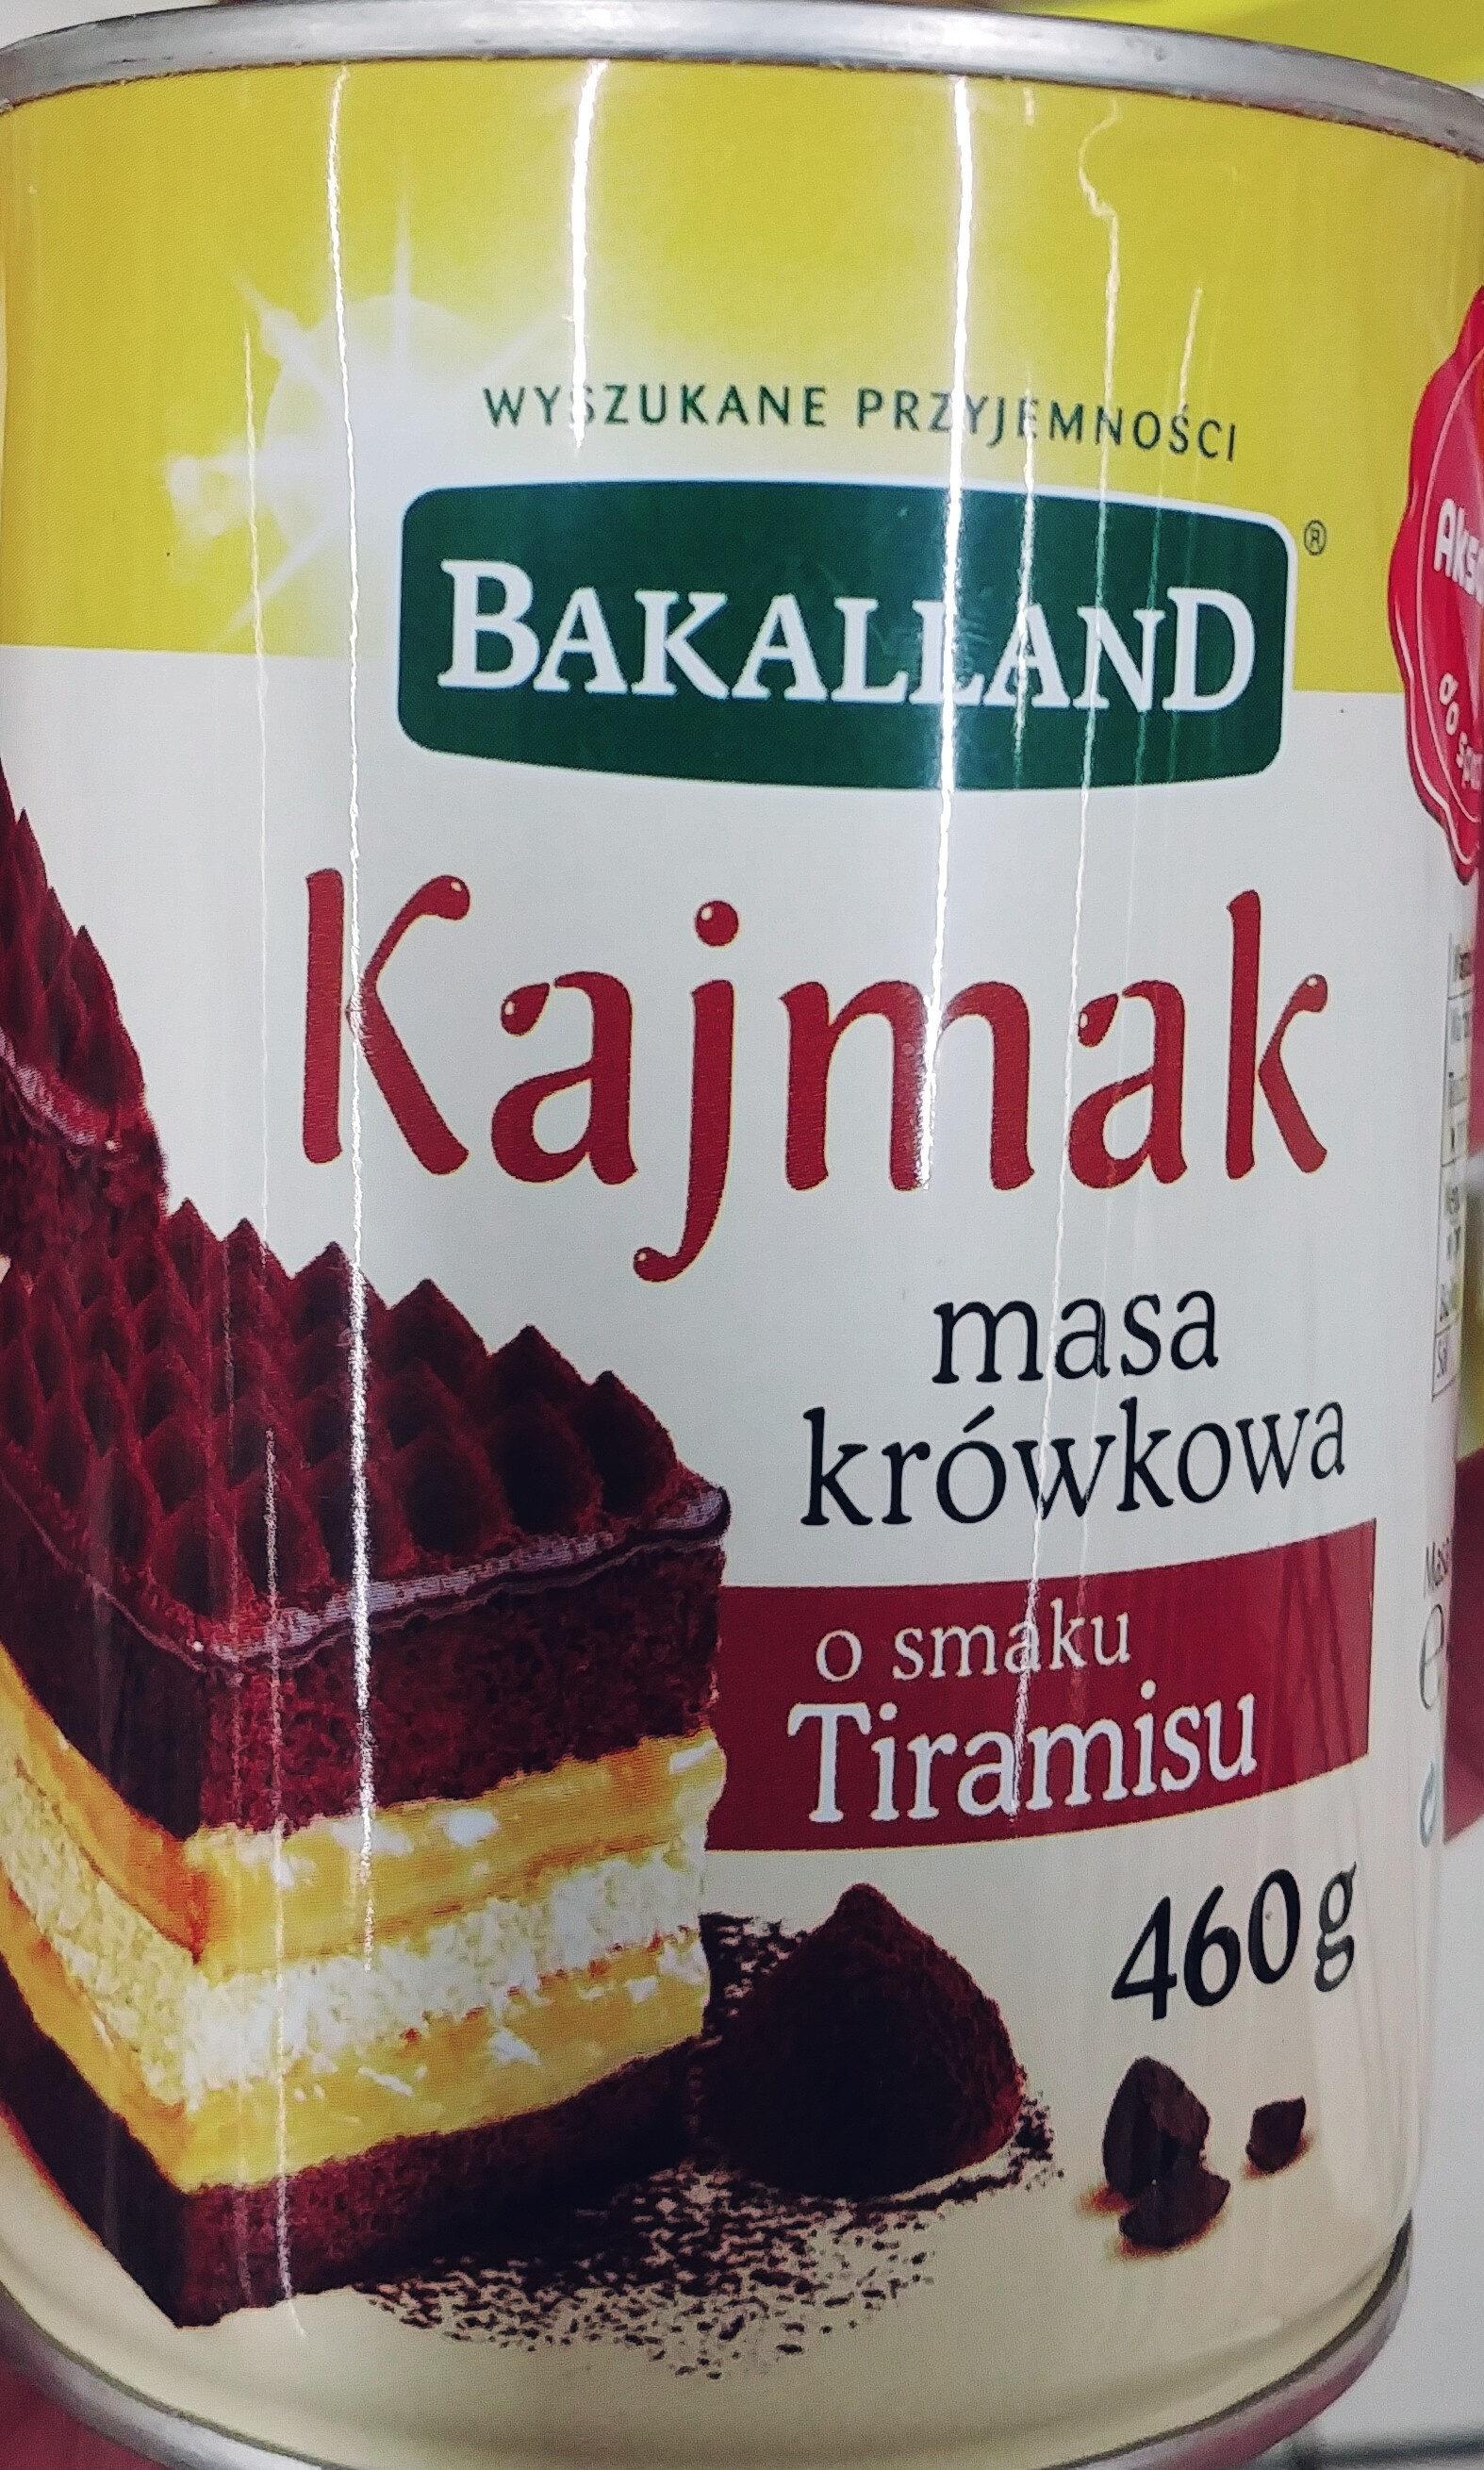 Kajmak - Masa krówkowa o smaku Tiramisu - Product - pl